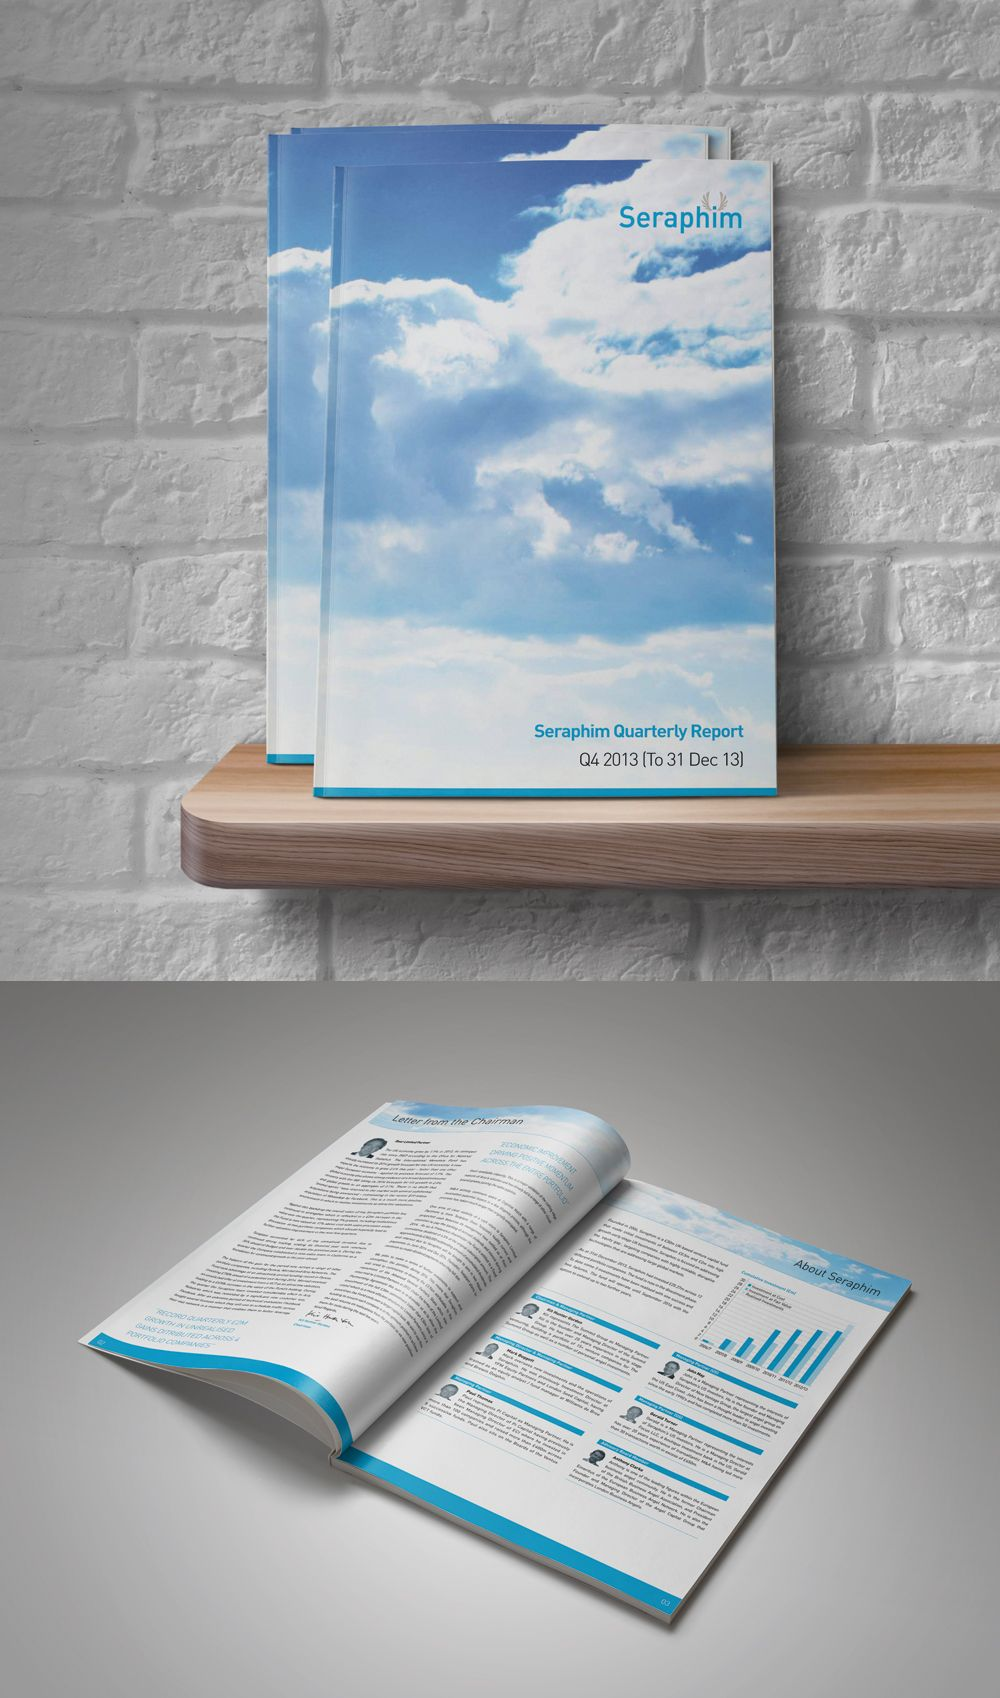 Quarterly financial report design for Seraphim Capital by lunatrix.co.uk #quarterlyreport #reportdesign #financialreport